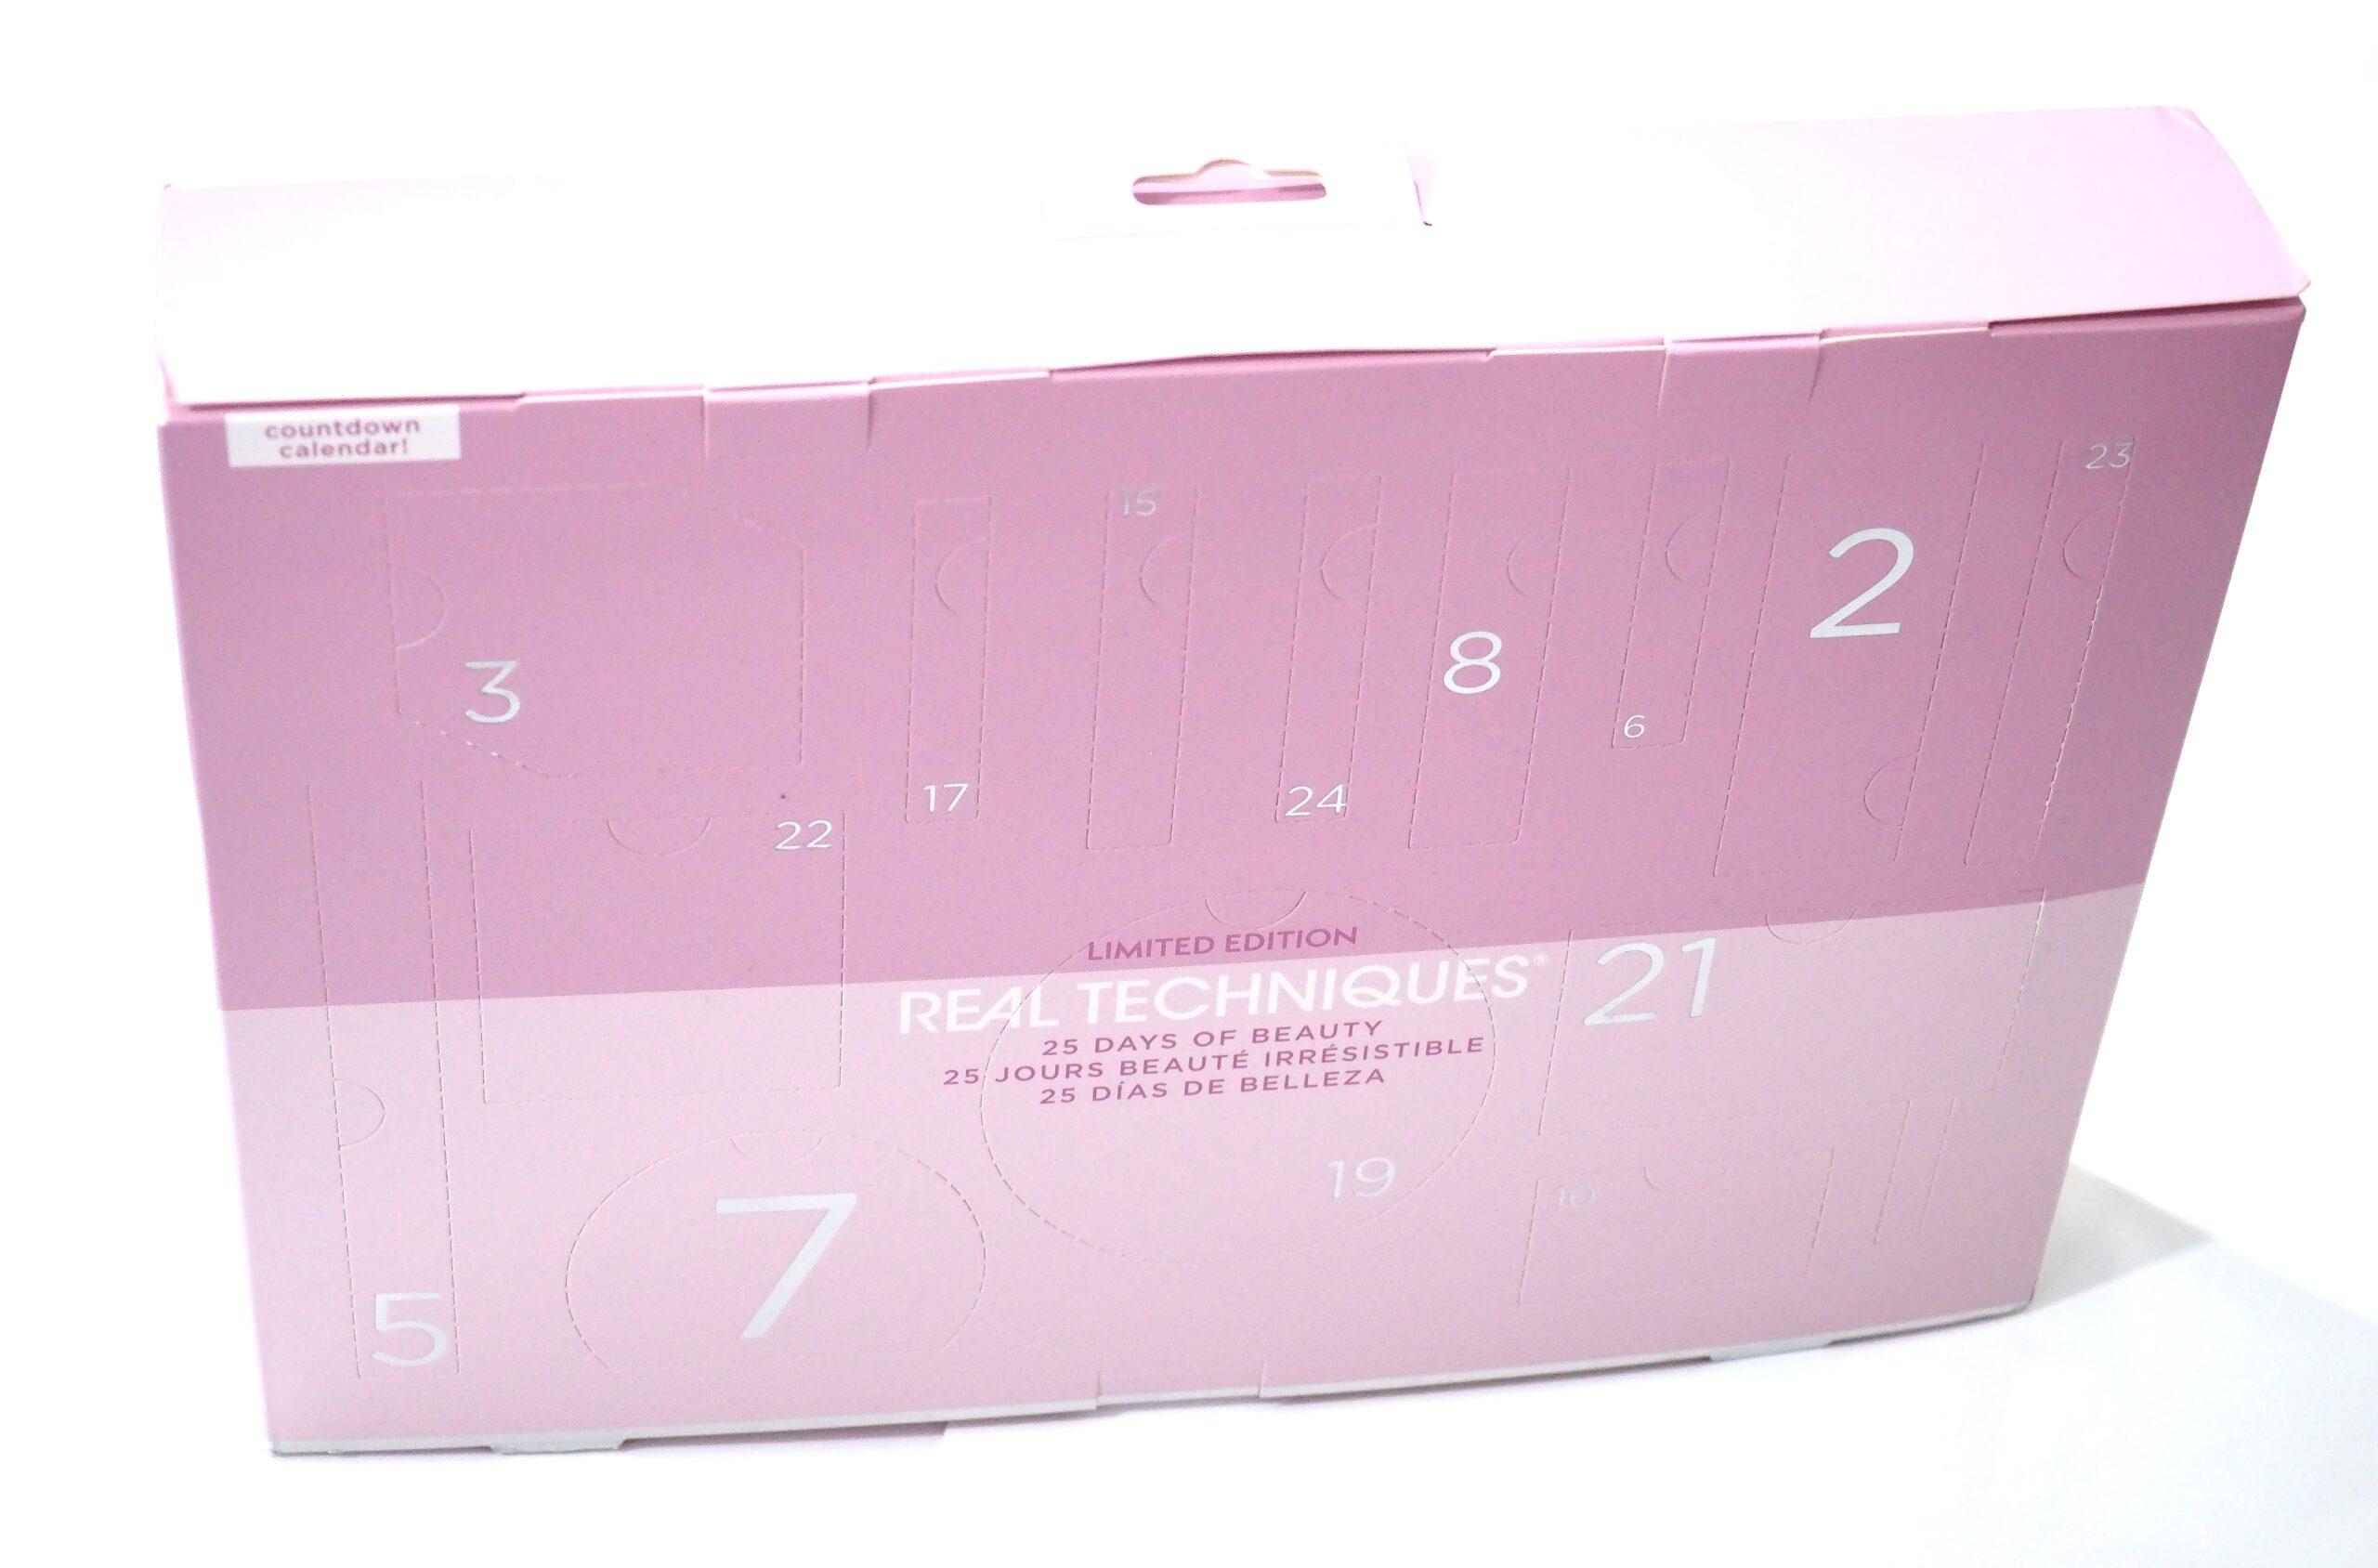 Real Techniques Advent Calendar 2021 Unboxing + Review